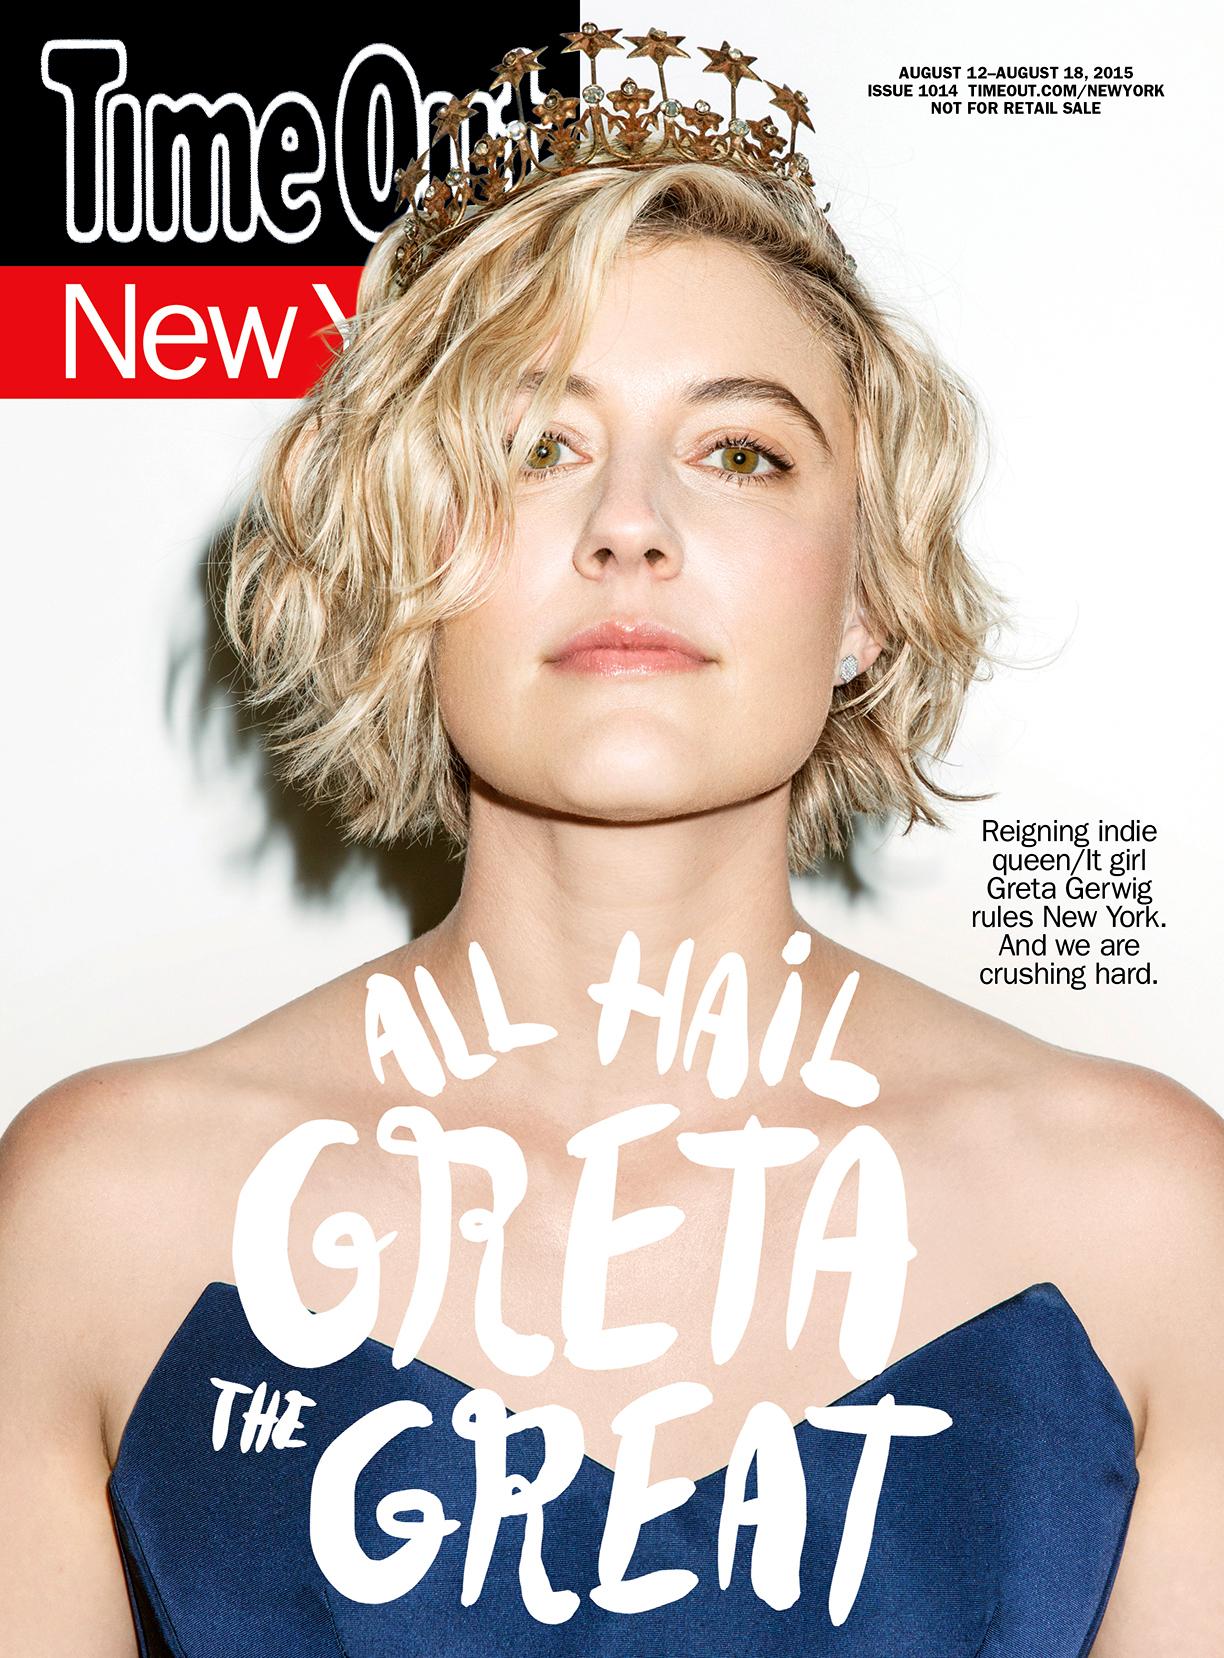 2018 Golden Globes nominee, Greta Gerwig shines in an elegant Oscar de la  Renta black